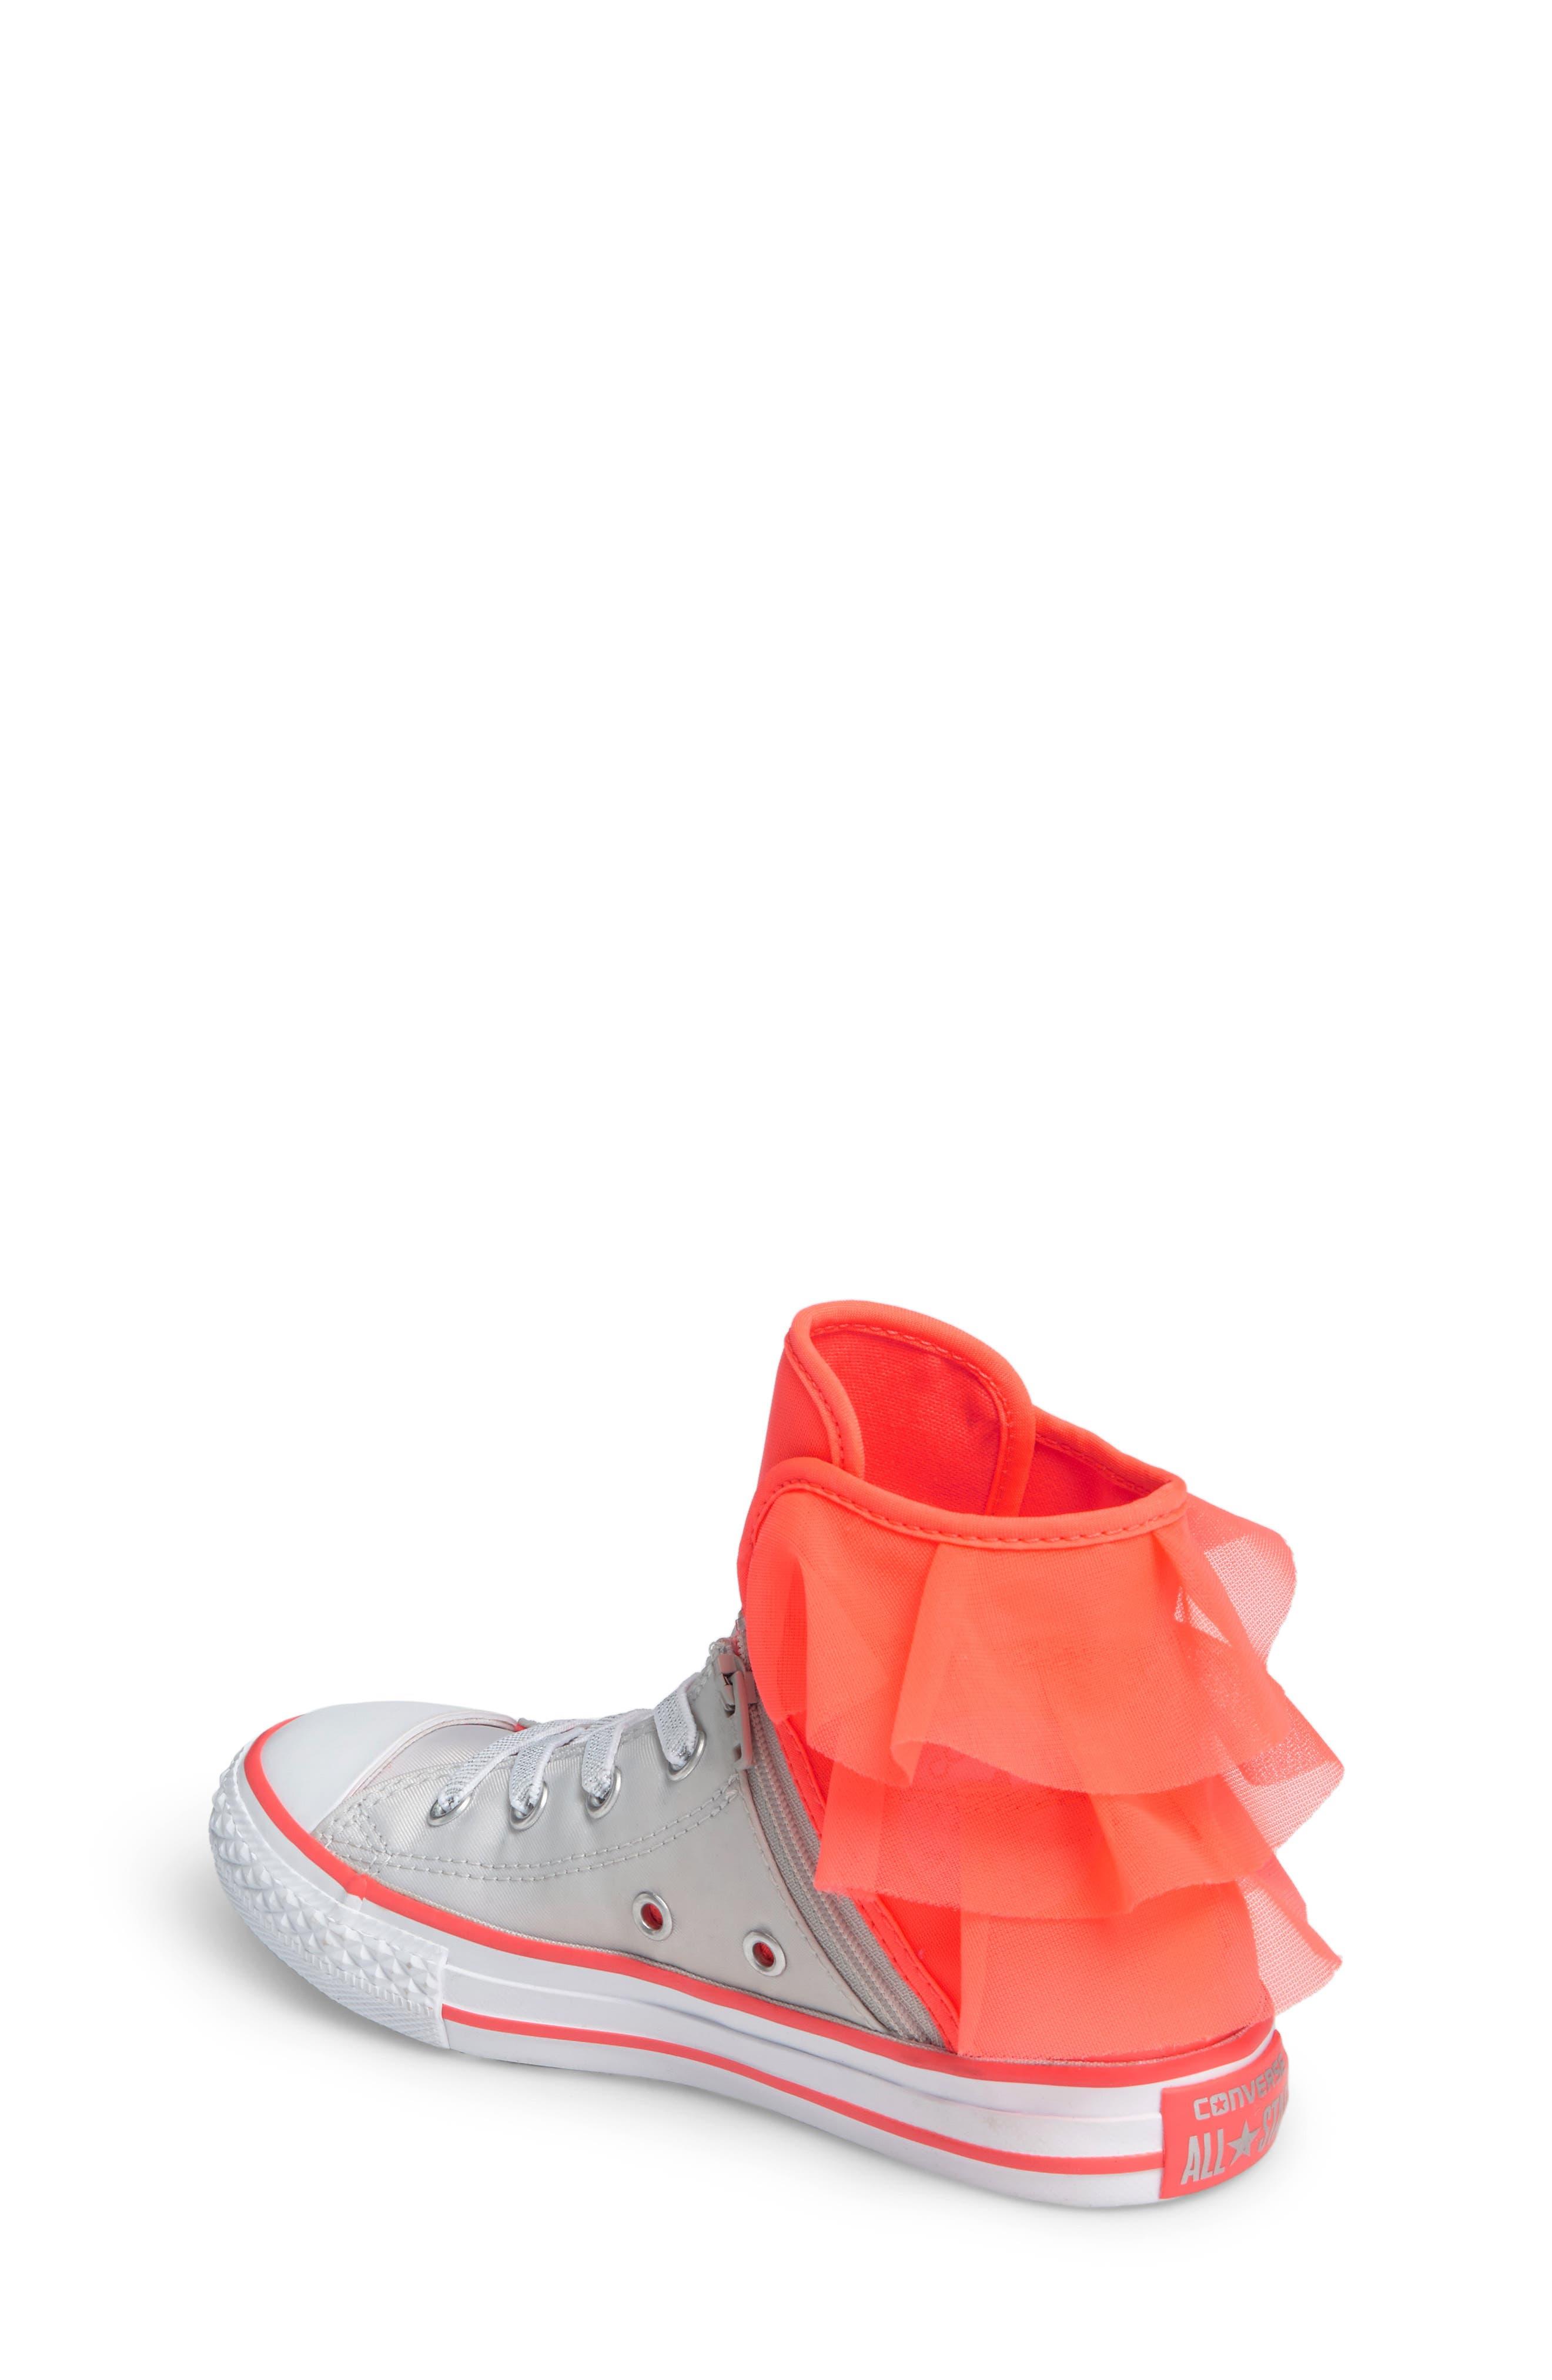 Alternate Image 2  - Converse Block Party High Top Sneaker (Baby, Walker, Toddler, Little Kid & Big Kid)